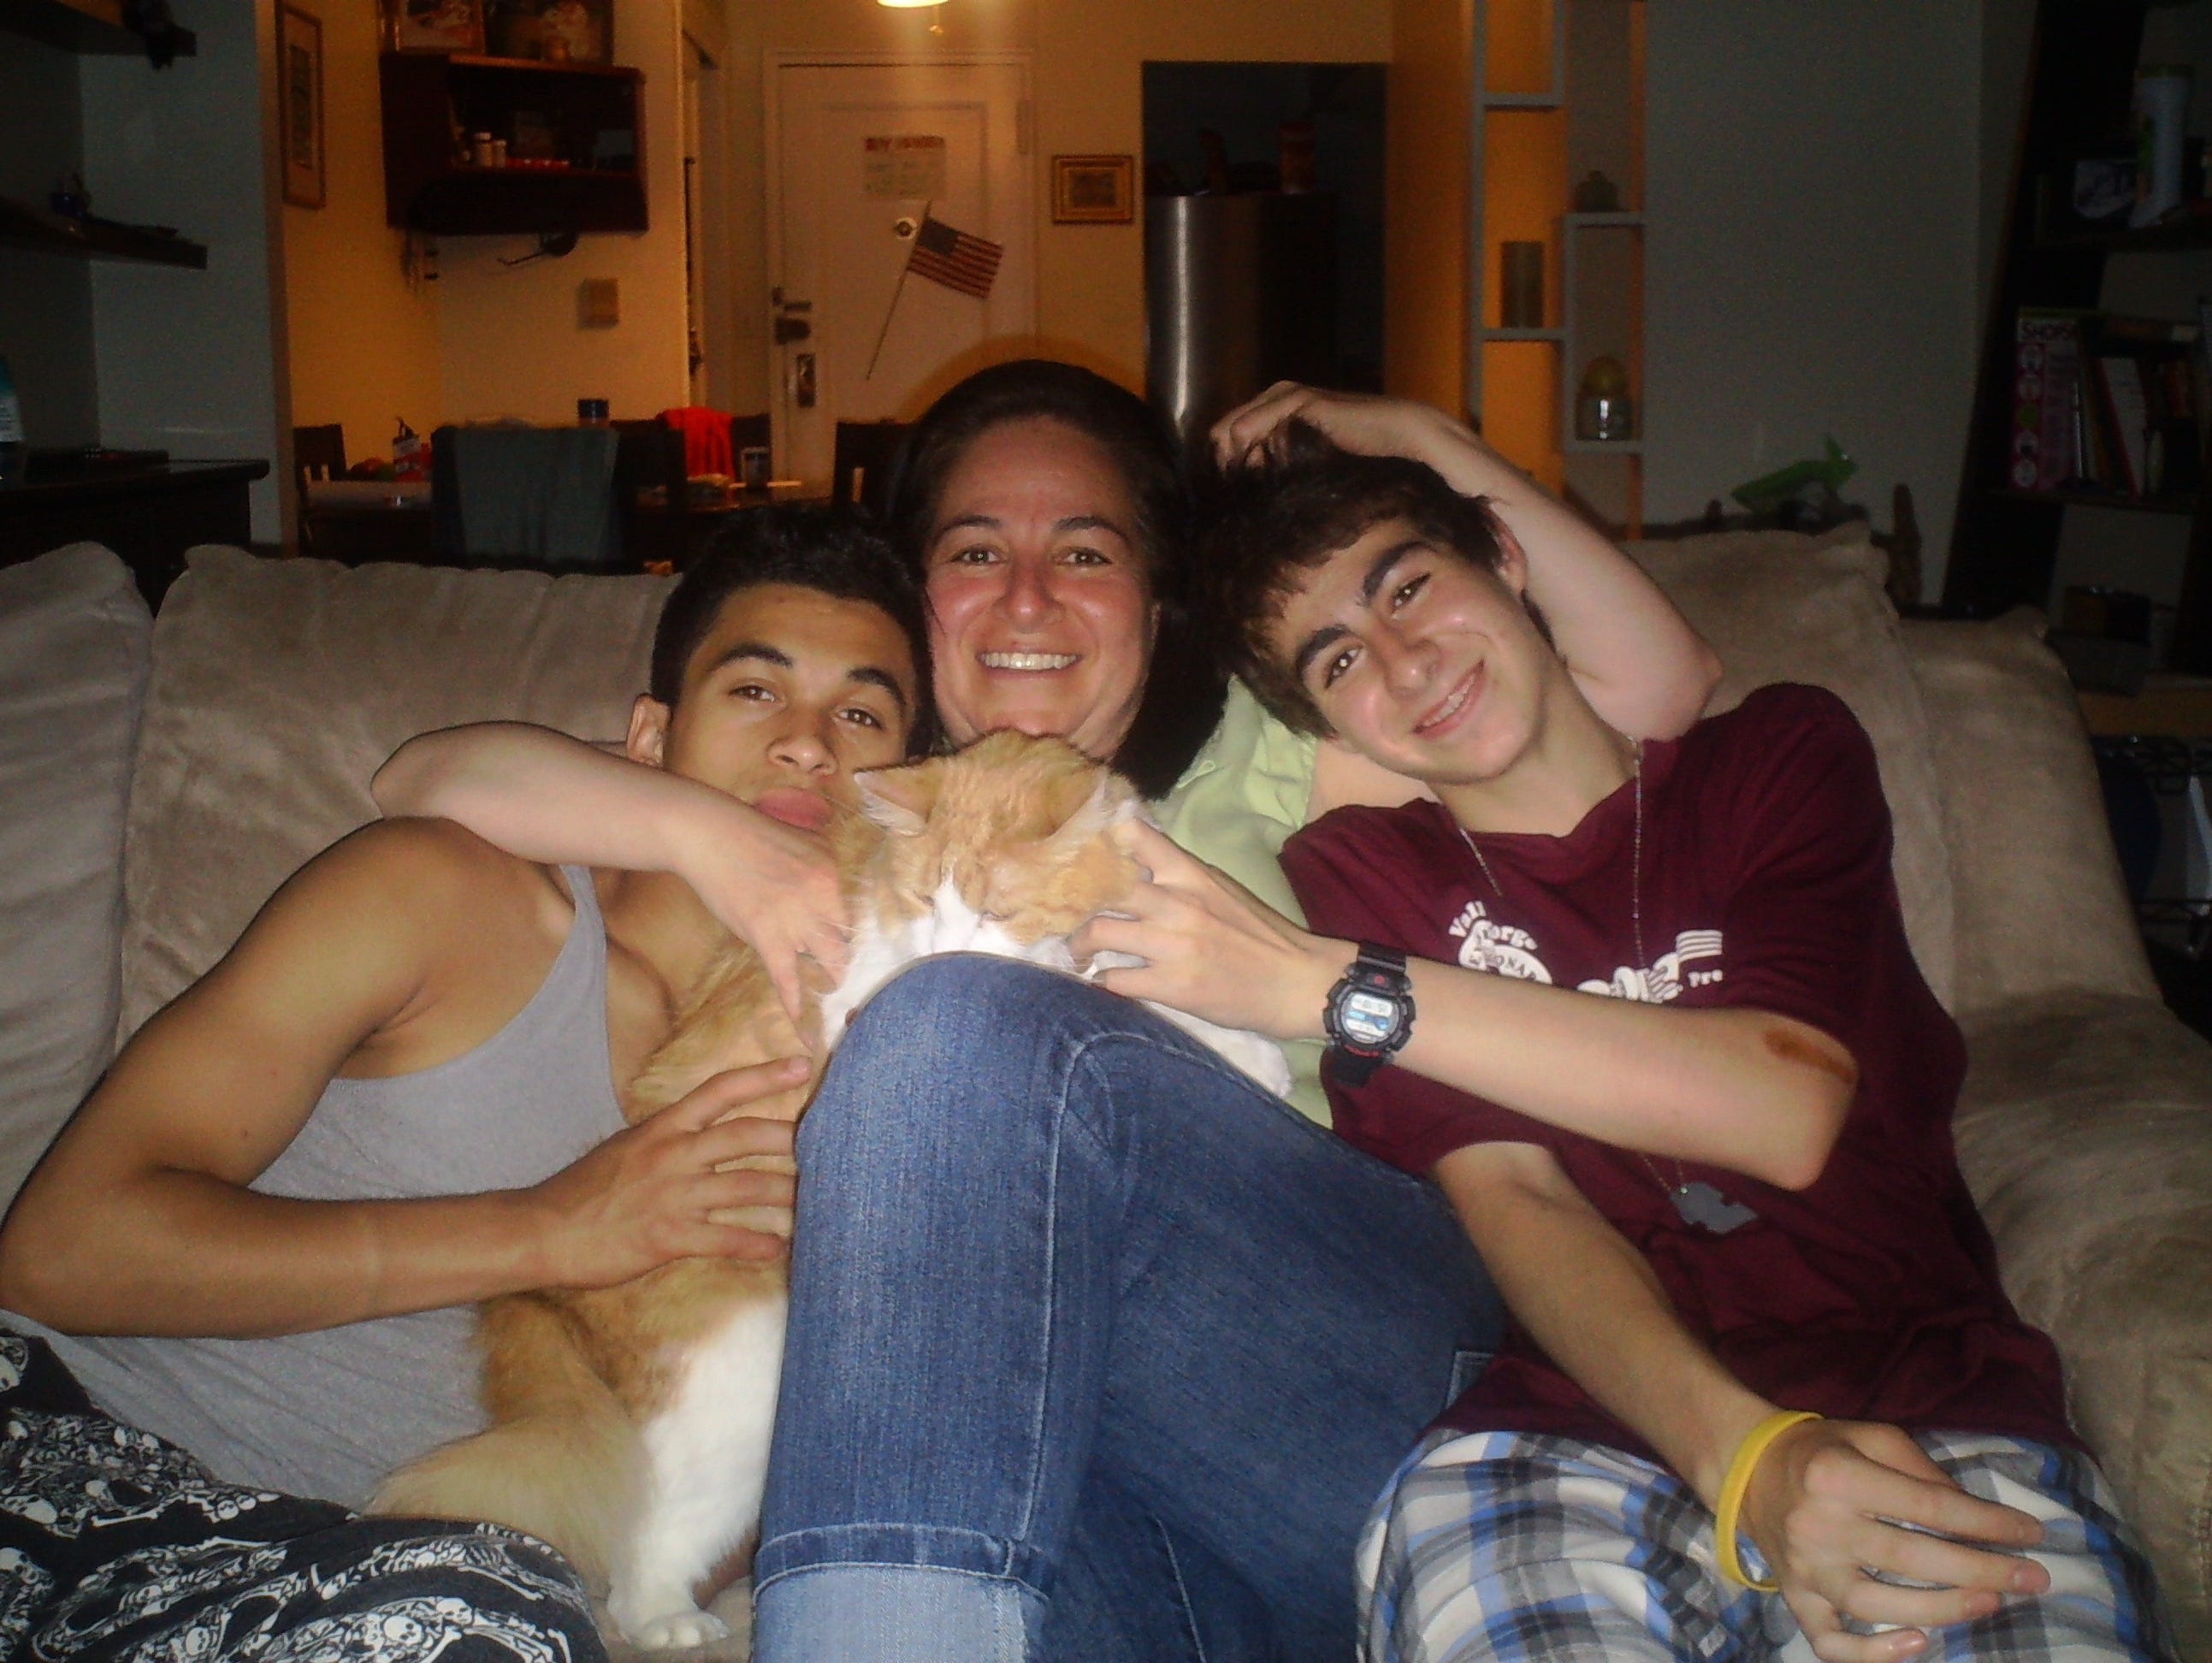 The Tera family: Moises (left), Hope and Ian.